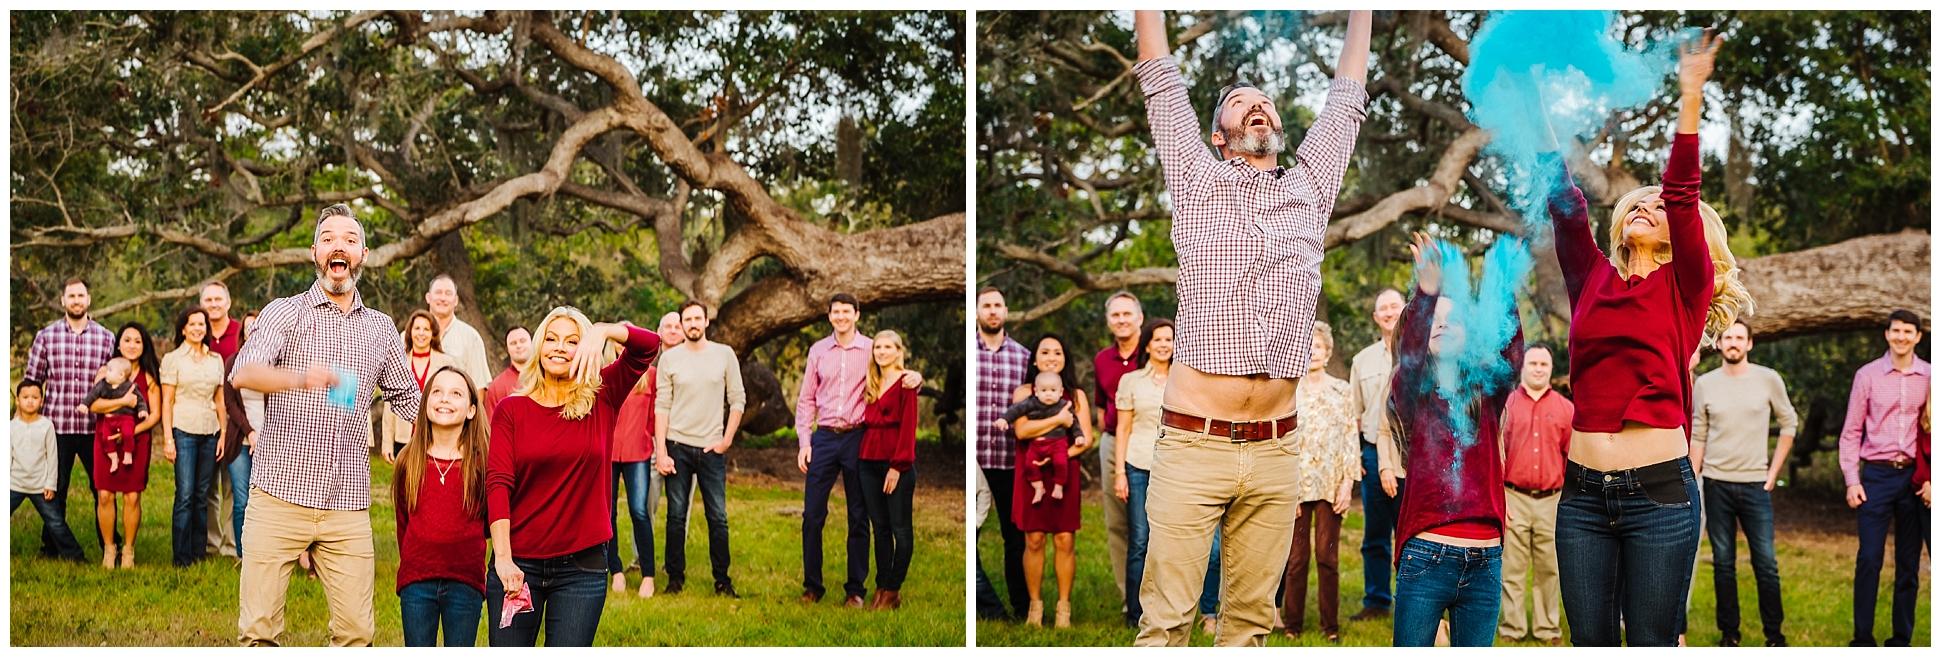 tampa-oak tree-park-holiday-gender reveal-family session_0042.jpg